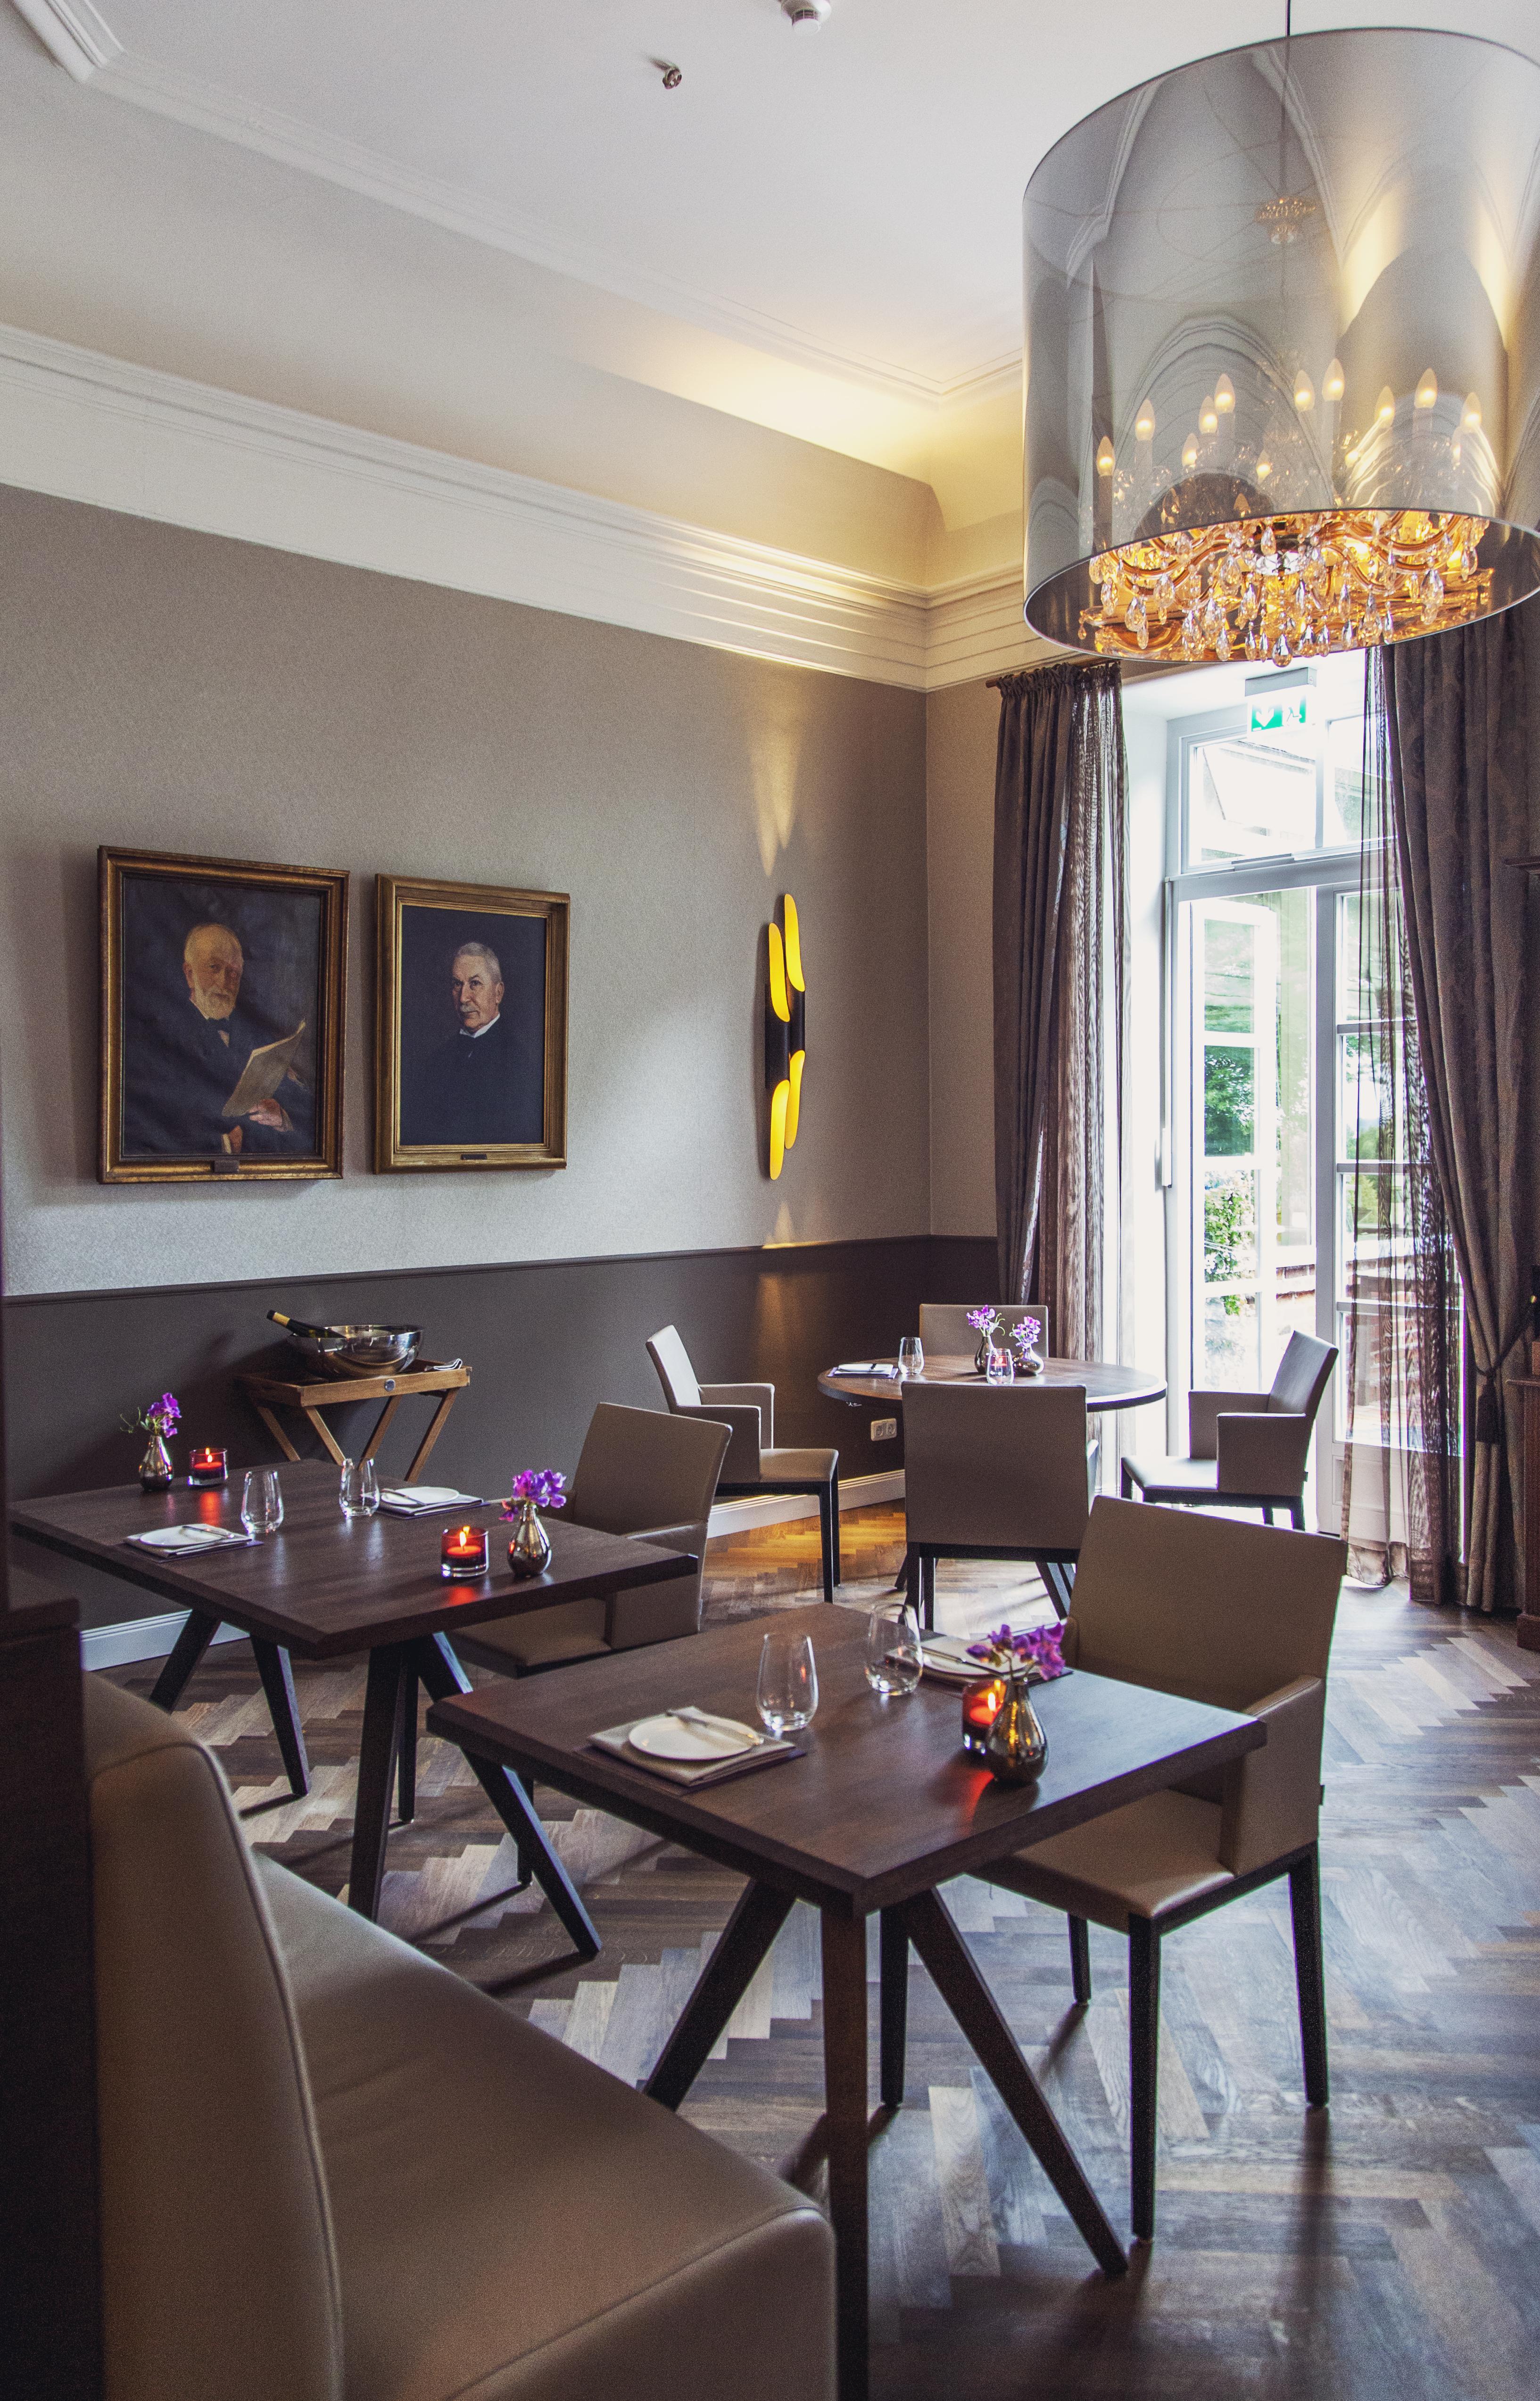 KielerKaufmann_Kiel_Hotel_Villa_Duesternbrook_Kiel_Ahlmanns_Restaurant